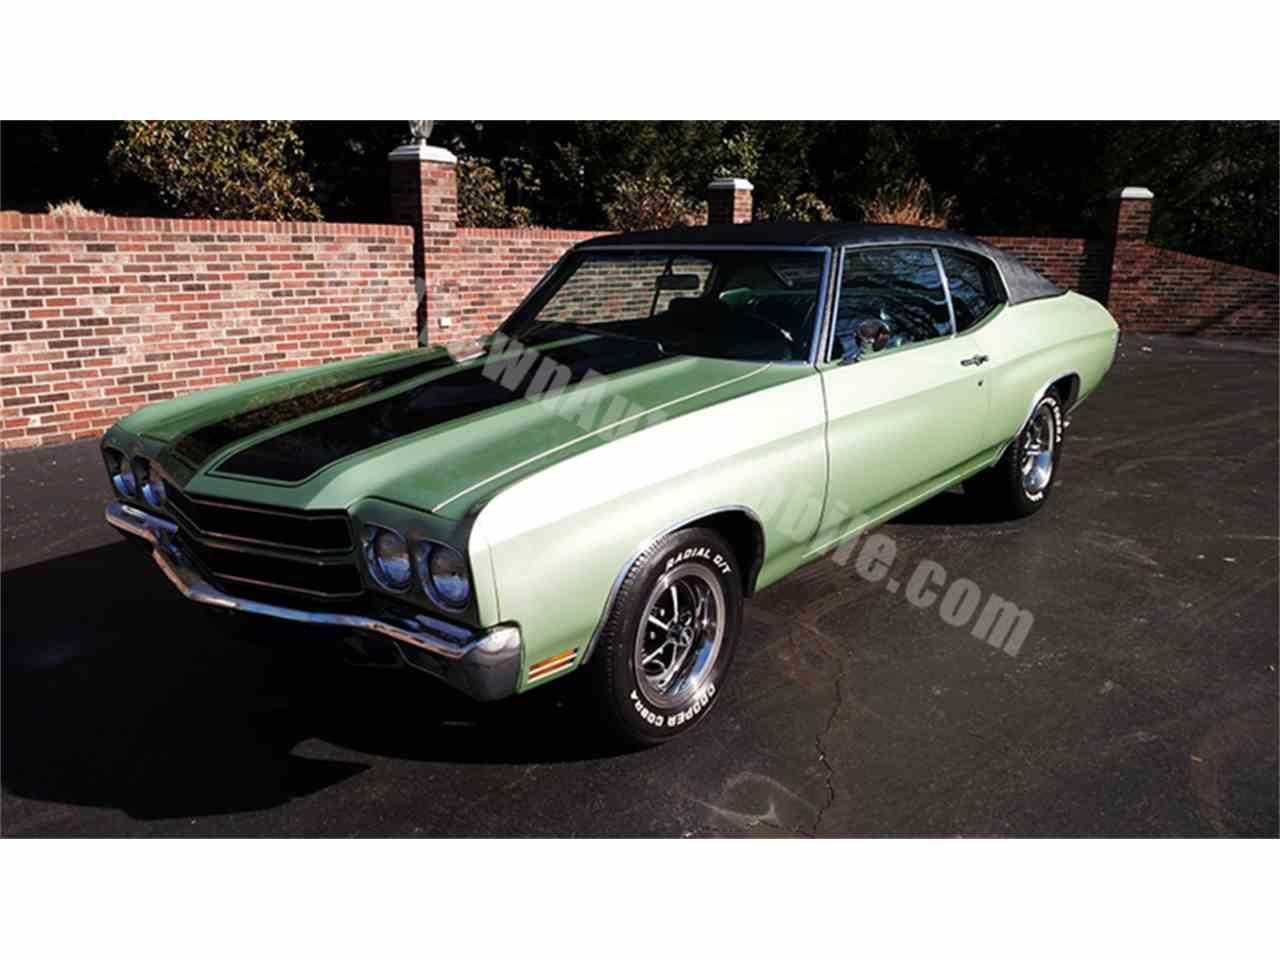 1970 Chevrolet Chevelle for Sale | ClassicCars.com | CC-1061902